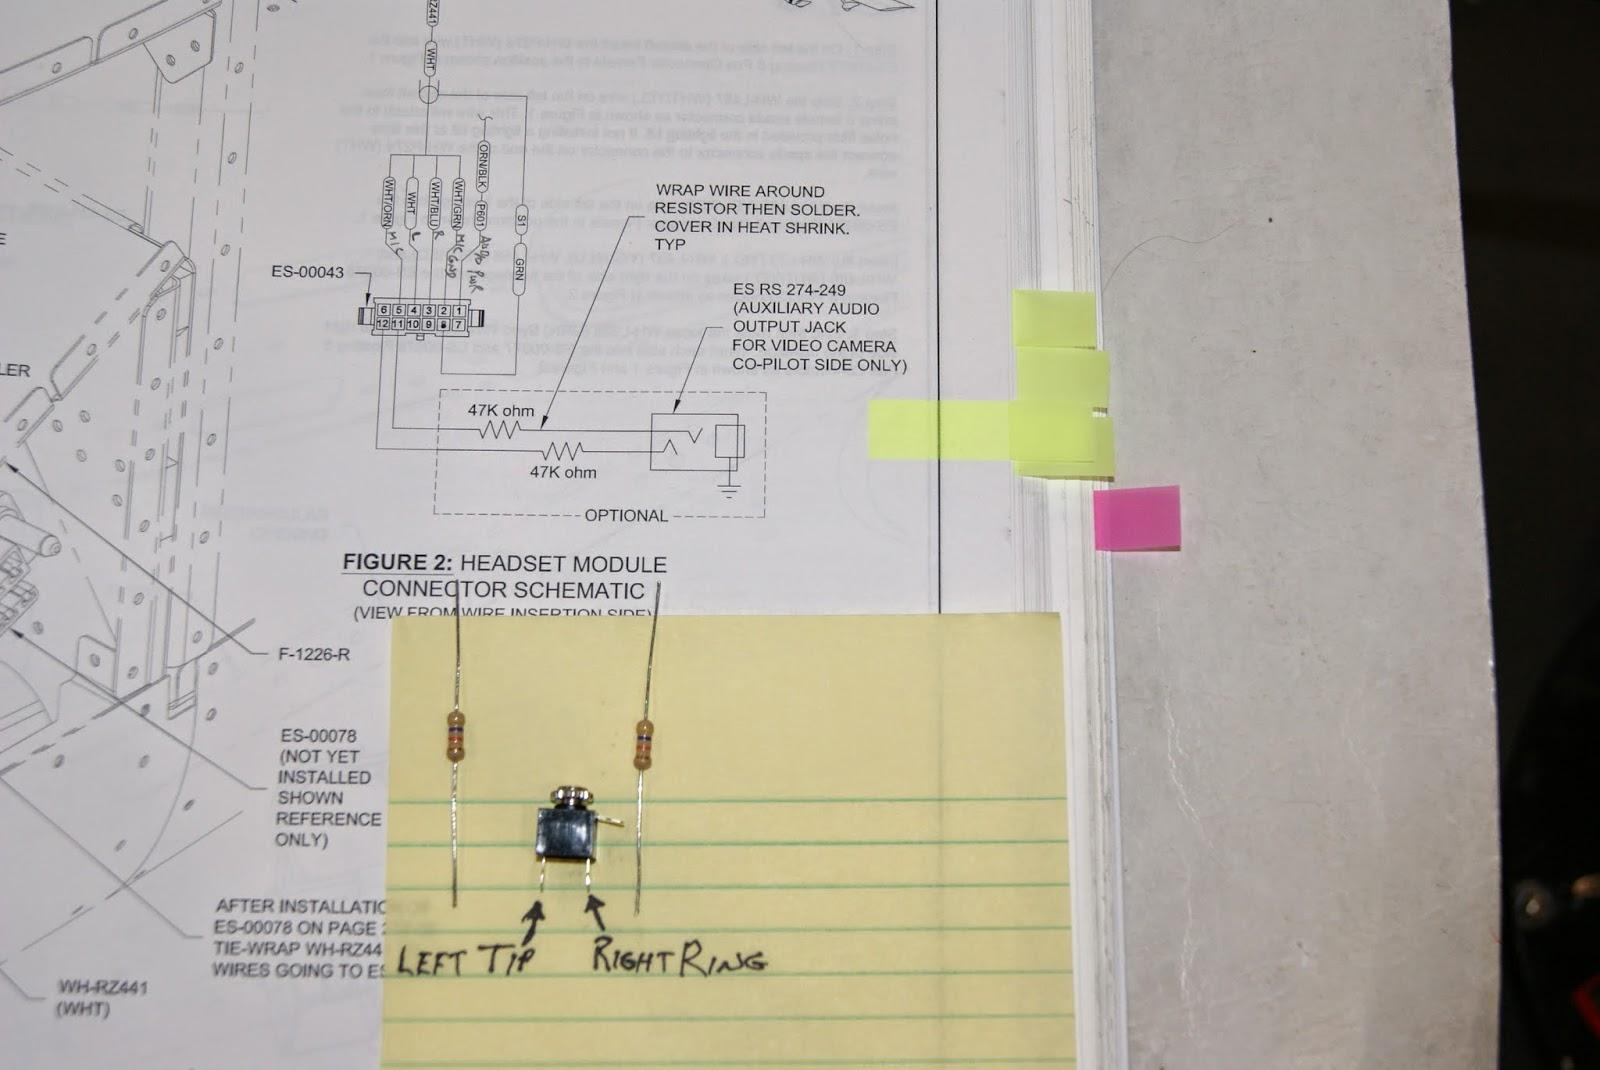 Fantastisch Headset Schaltplan Ideen - Verdrahtungsideen - korsmi.info